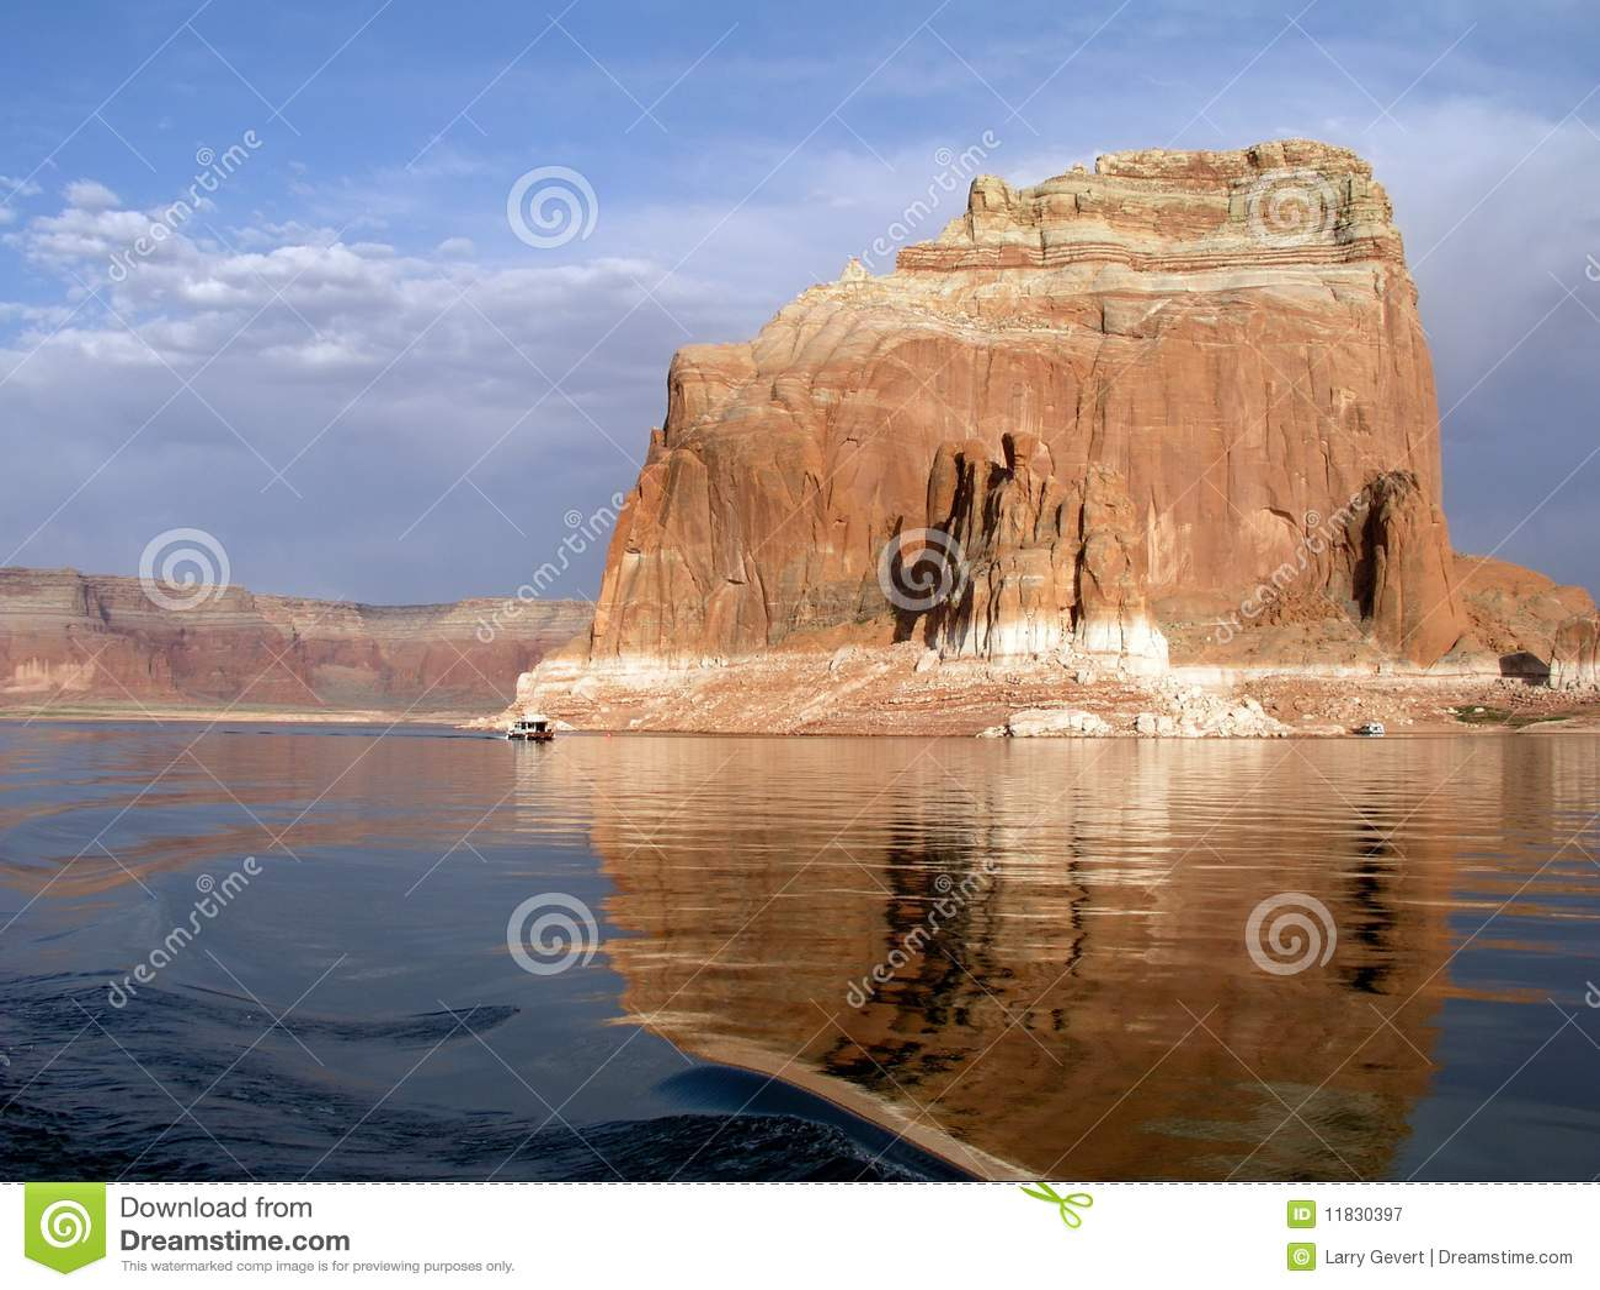 Houseboats At A Monolith At Lake Powell Royalty Free Stock Photography - Image: 11830397